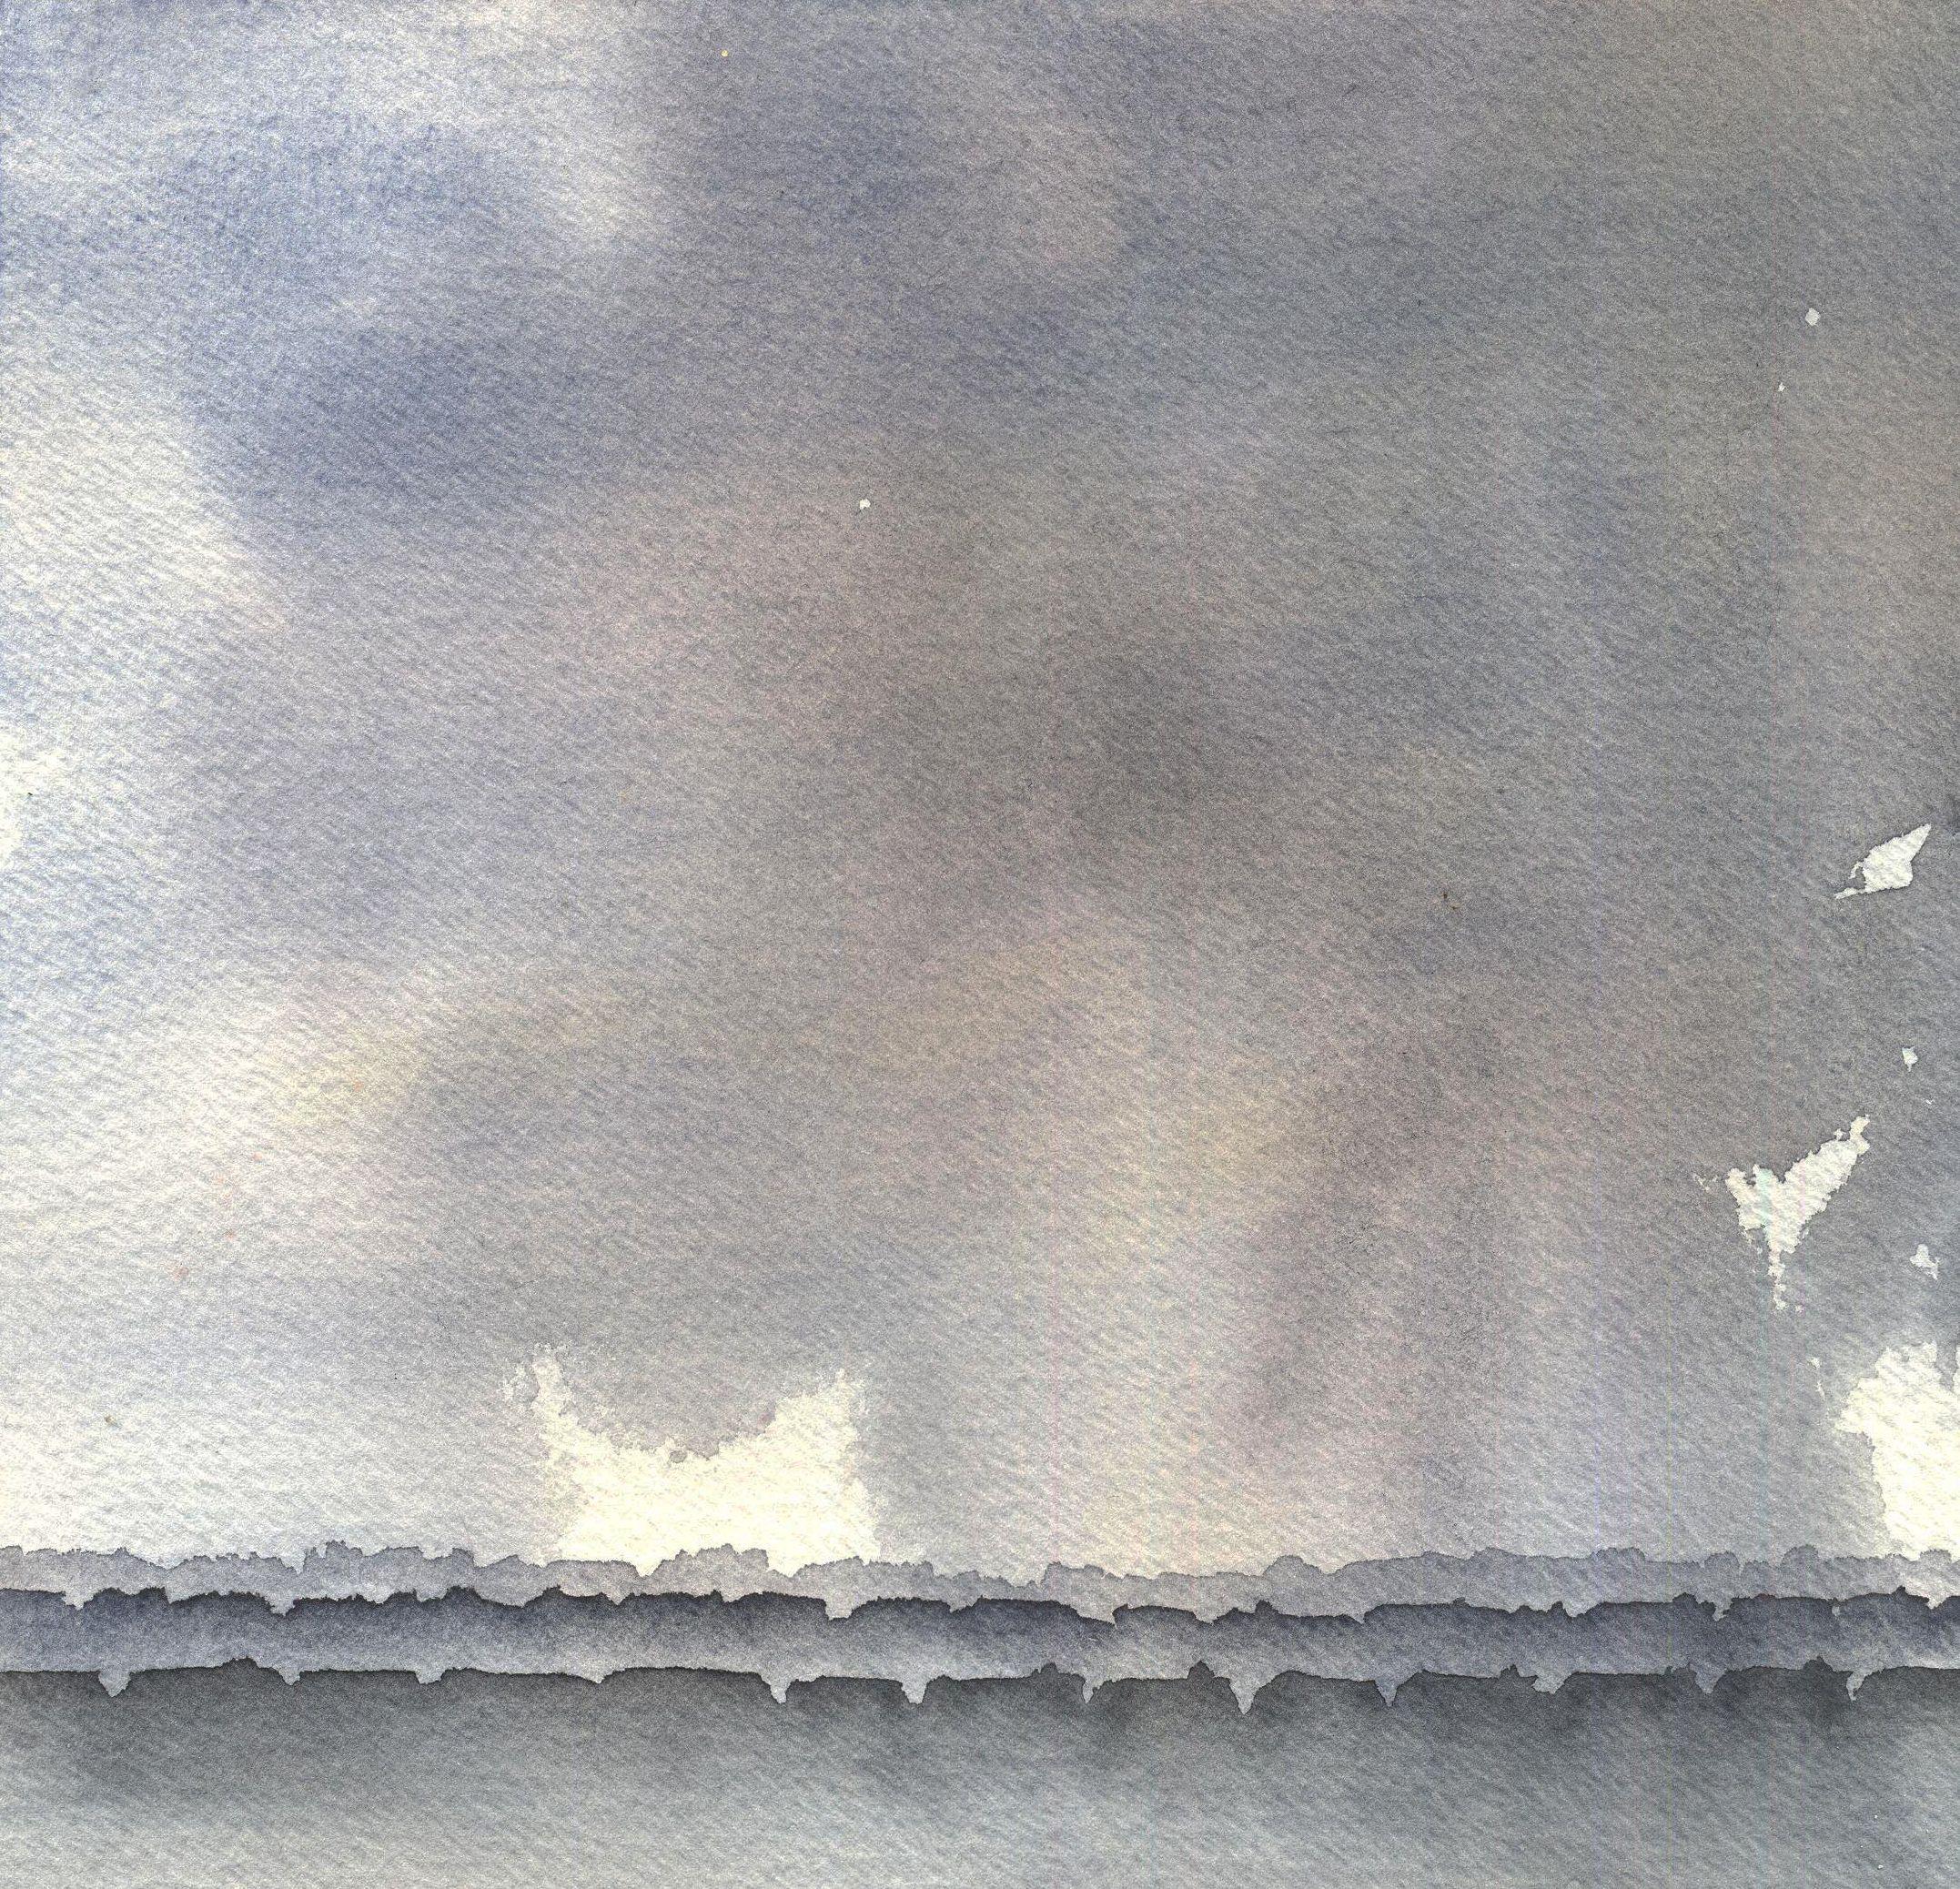 """Stormfront"" by Freddie Davies. 2015. Watercolour. http://freddie-davies.wix.com/artist"